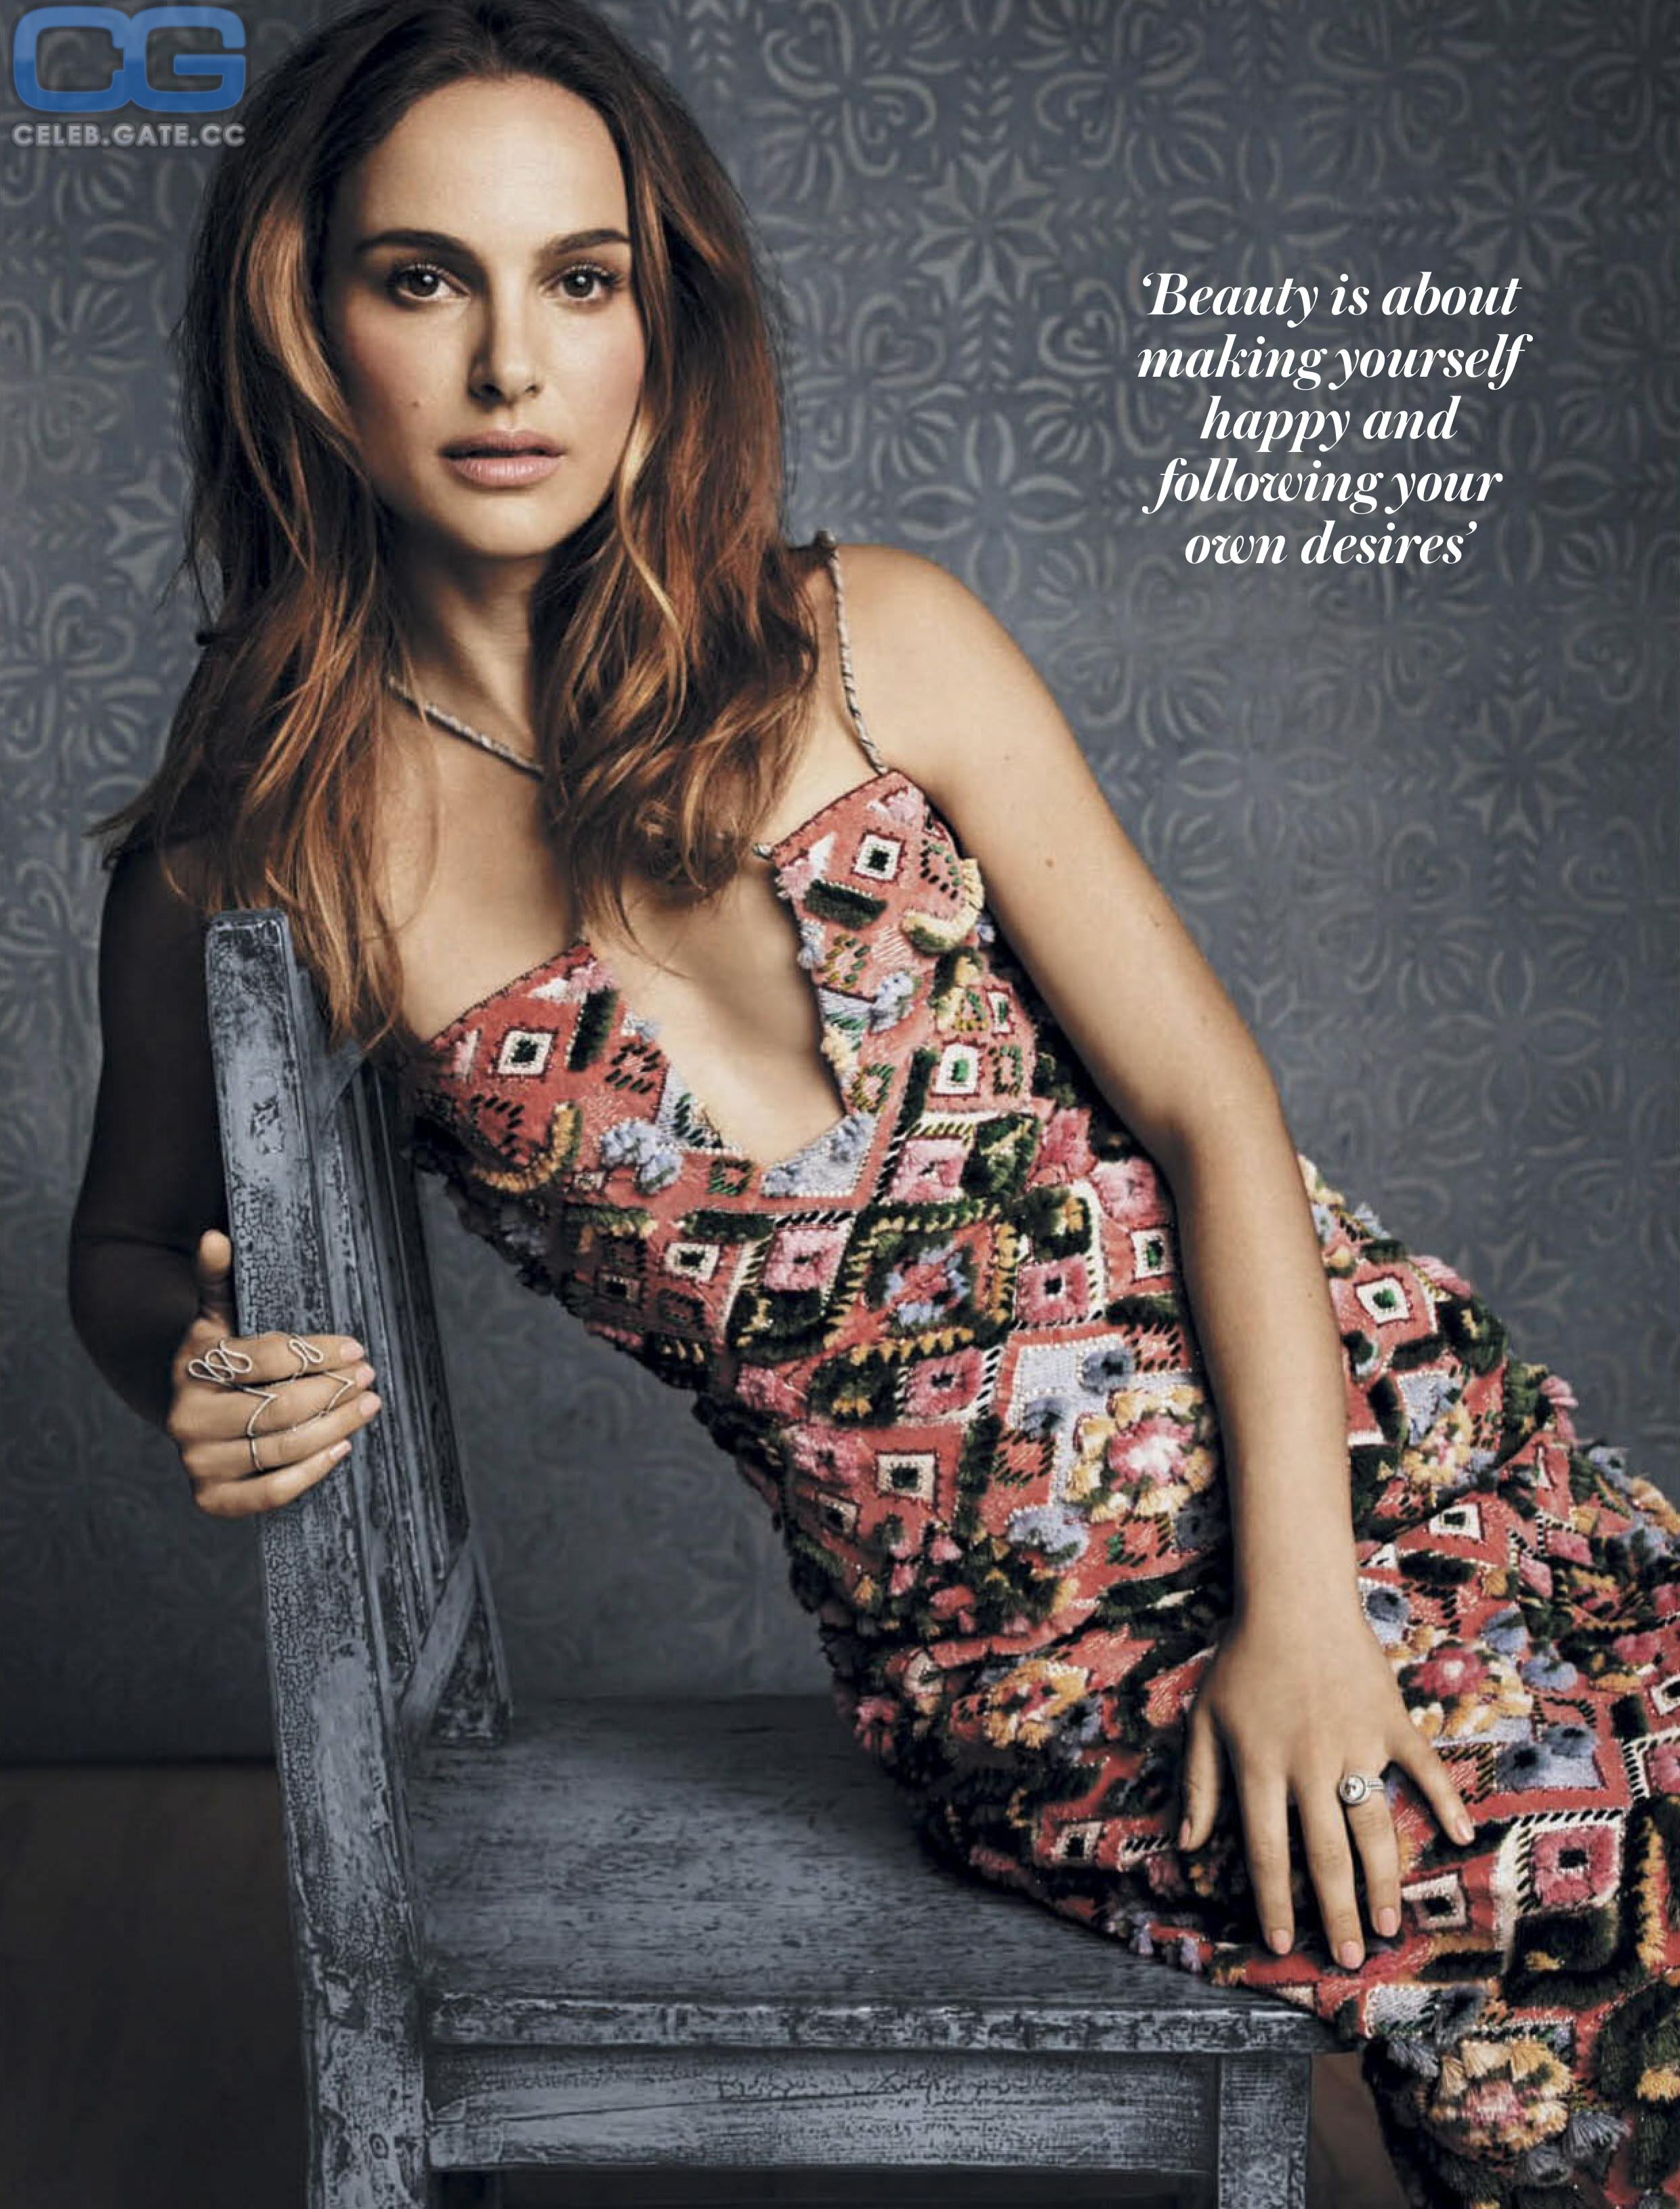 Nackt nathalie portmann Natalie Portman